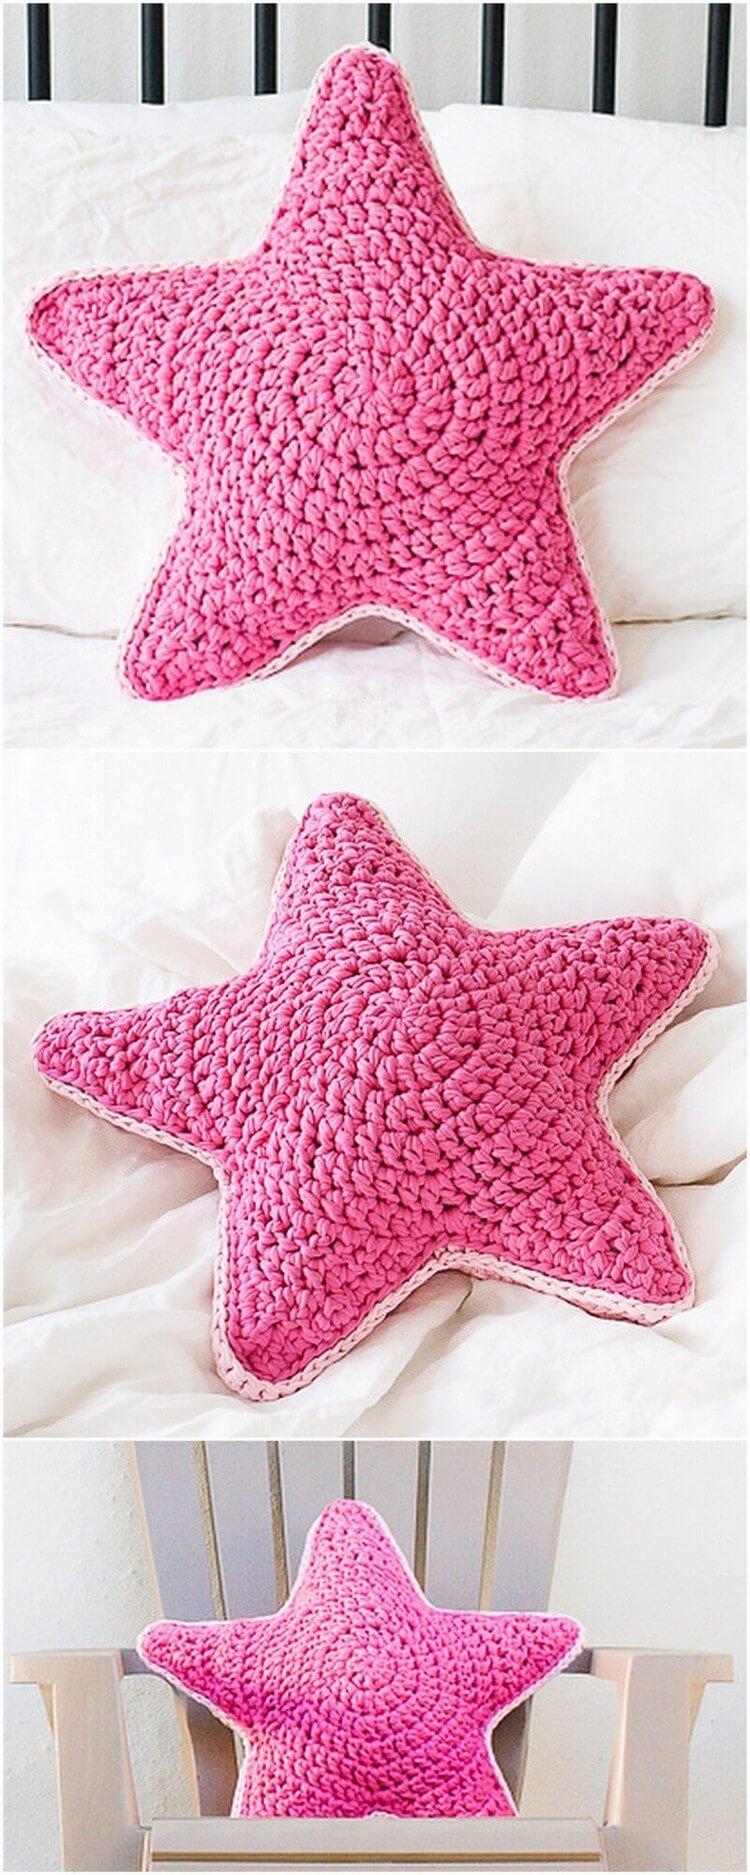 Crochet Pillow Free Pattern (70)